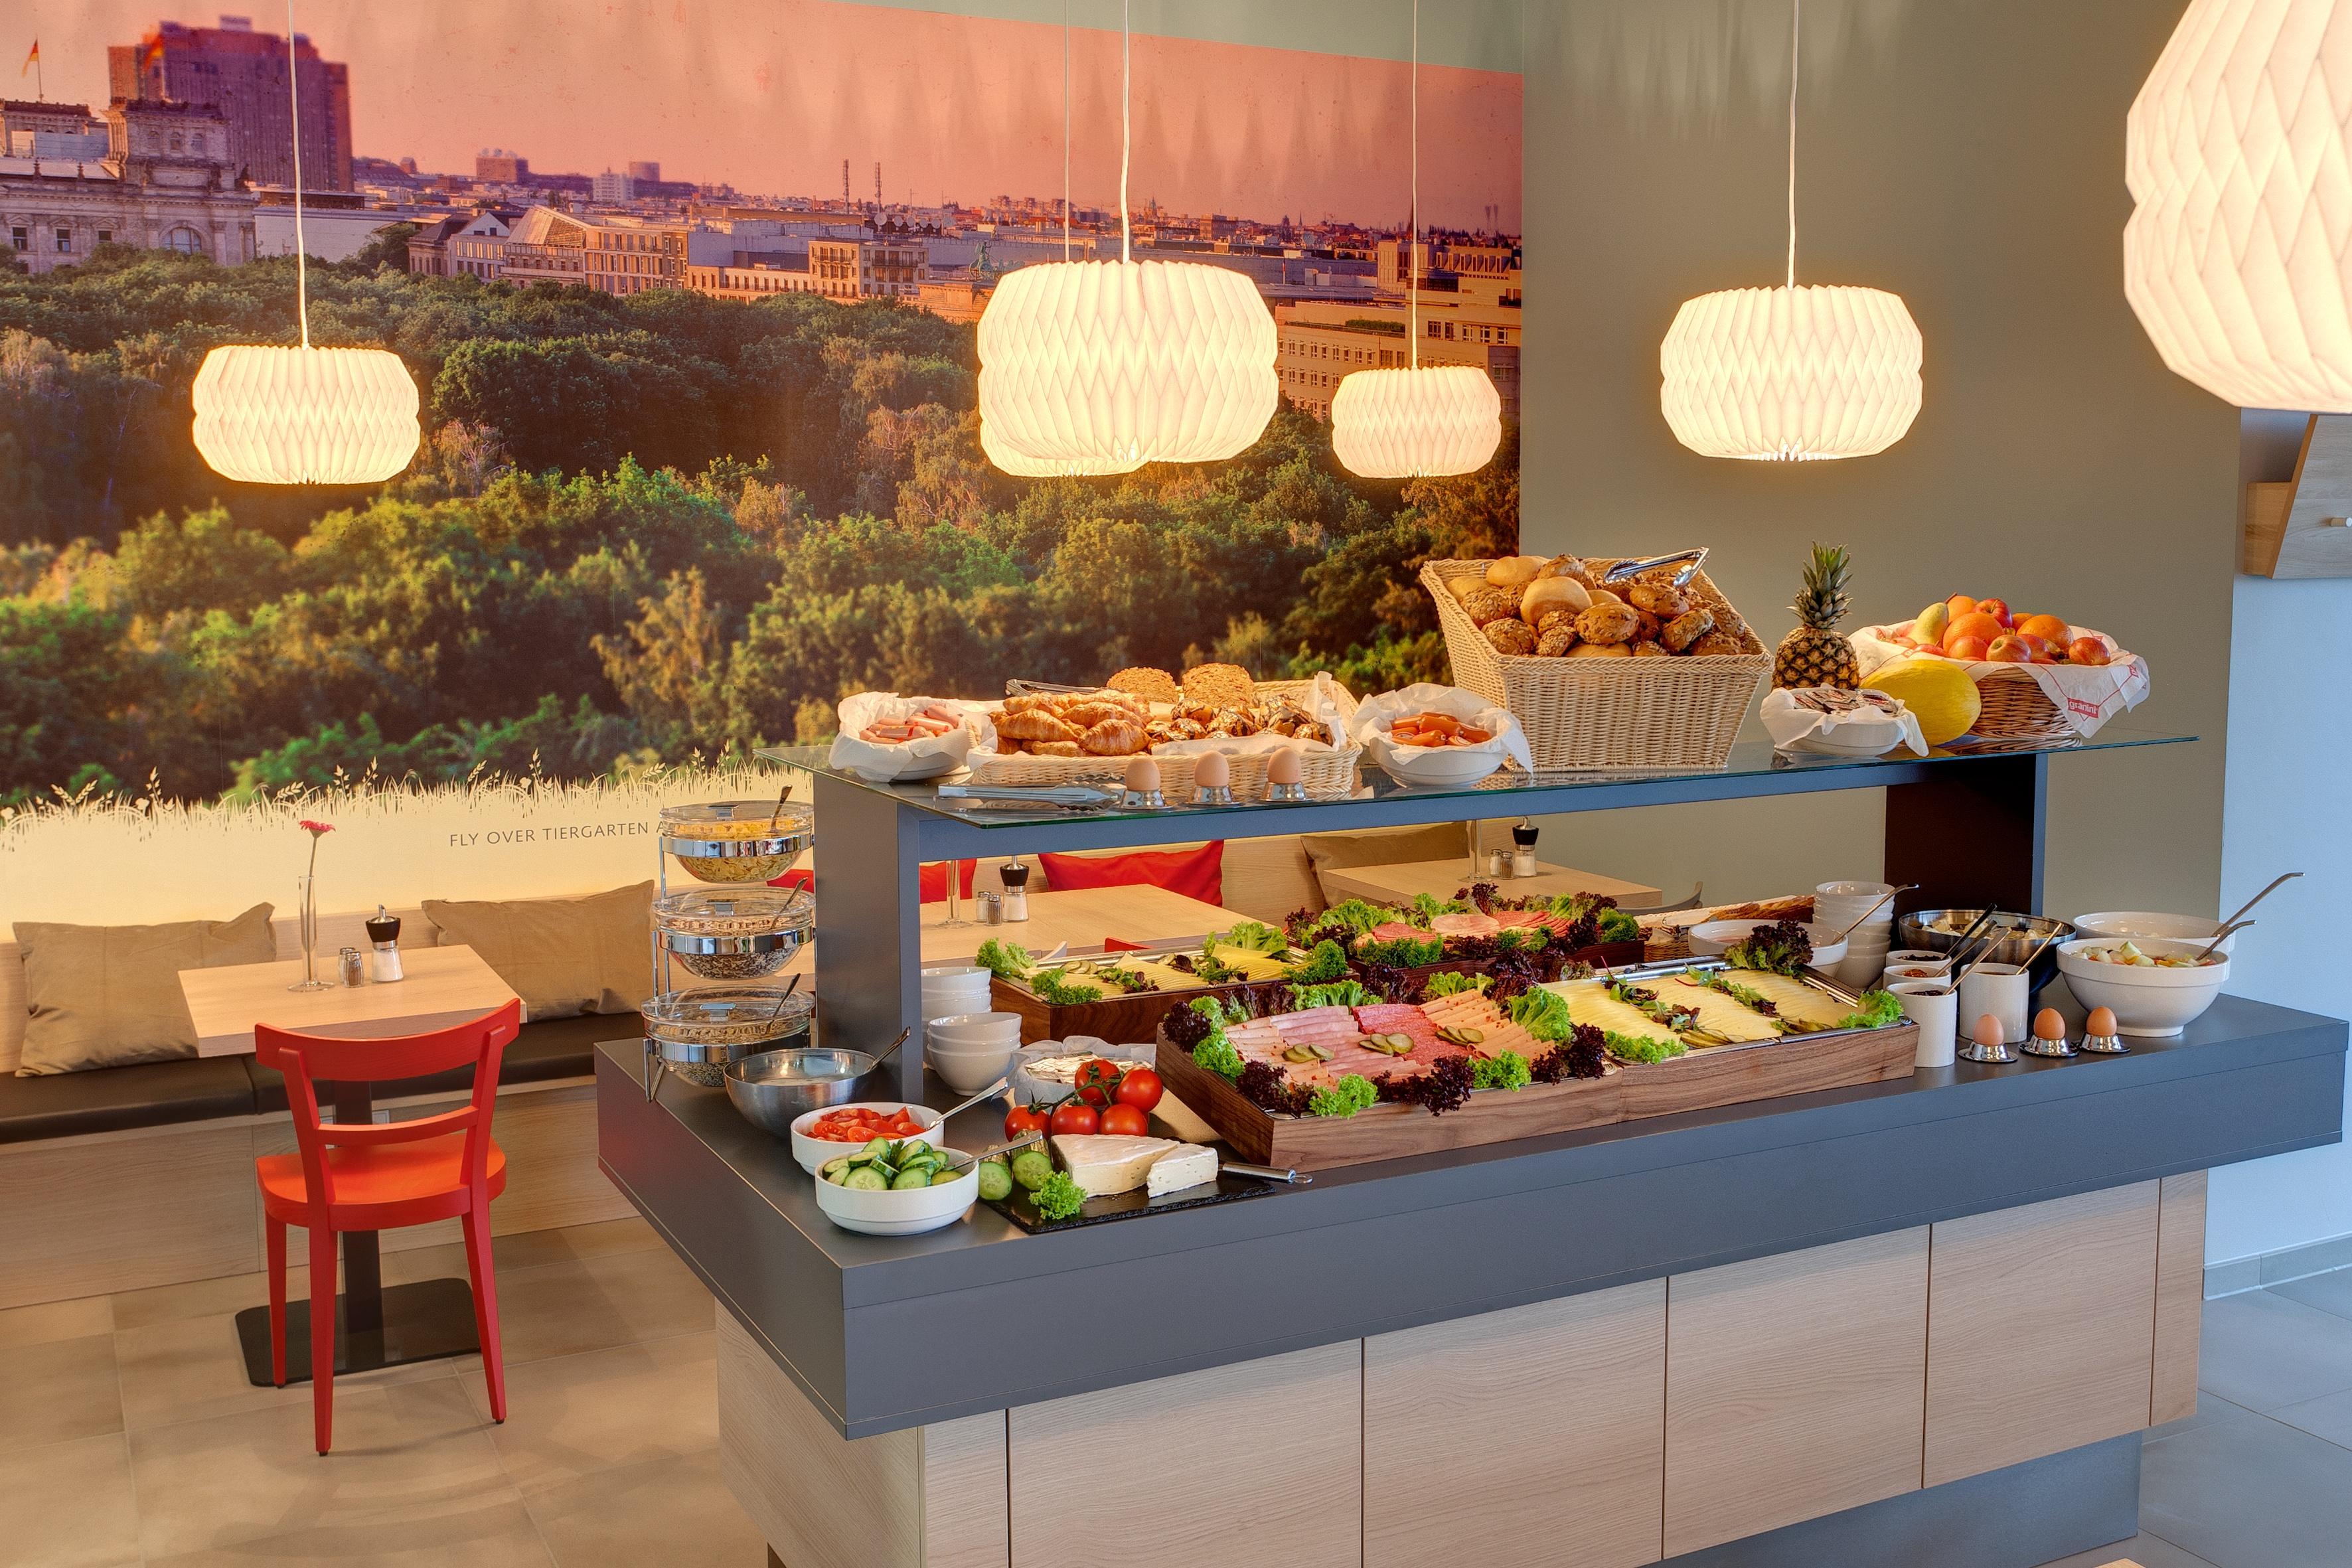 MEININGER Hotel Berlin Airport - Breakfast room/ Buffet